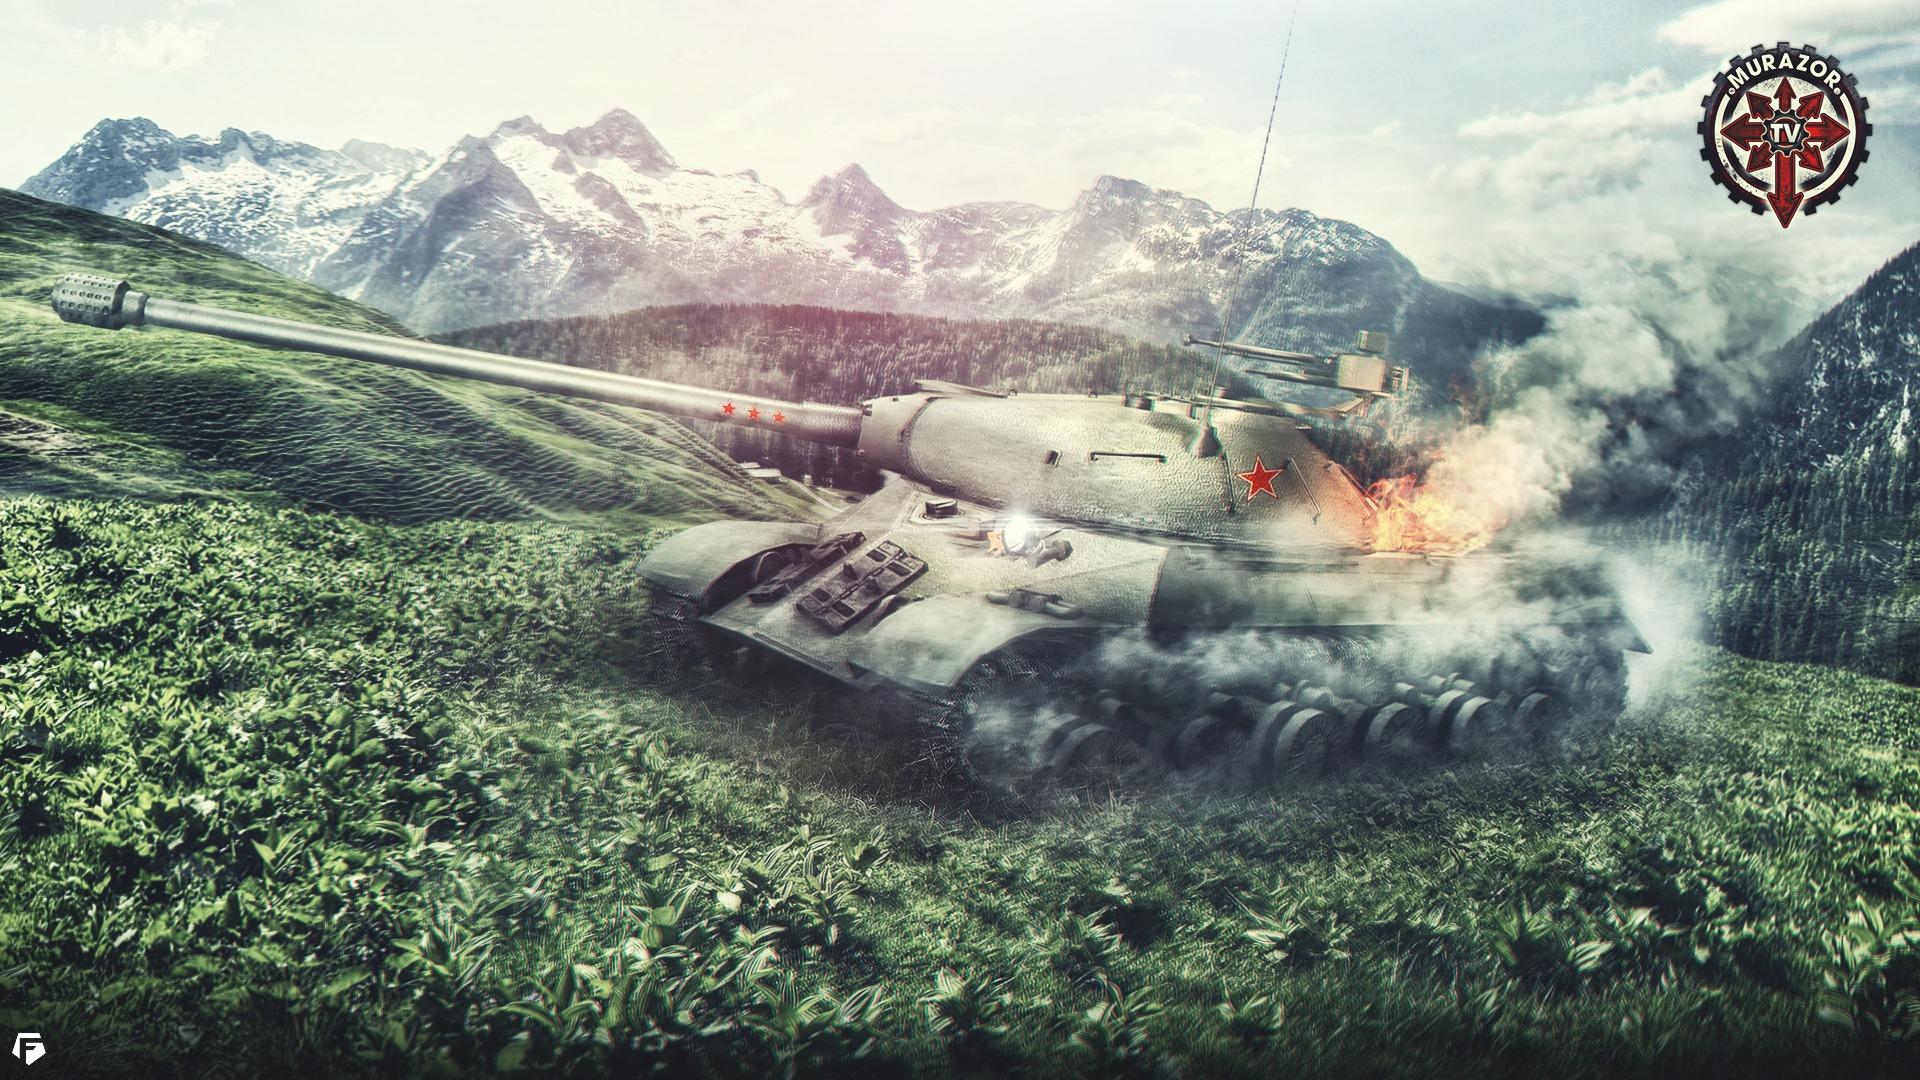 Картинки world of tanks на рабочий стол с голыми девушками